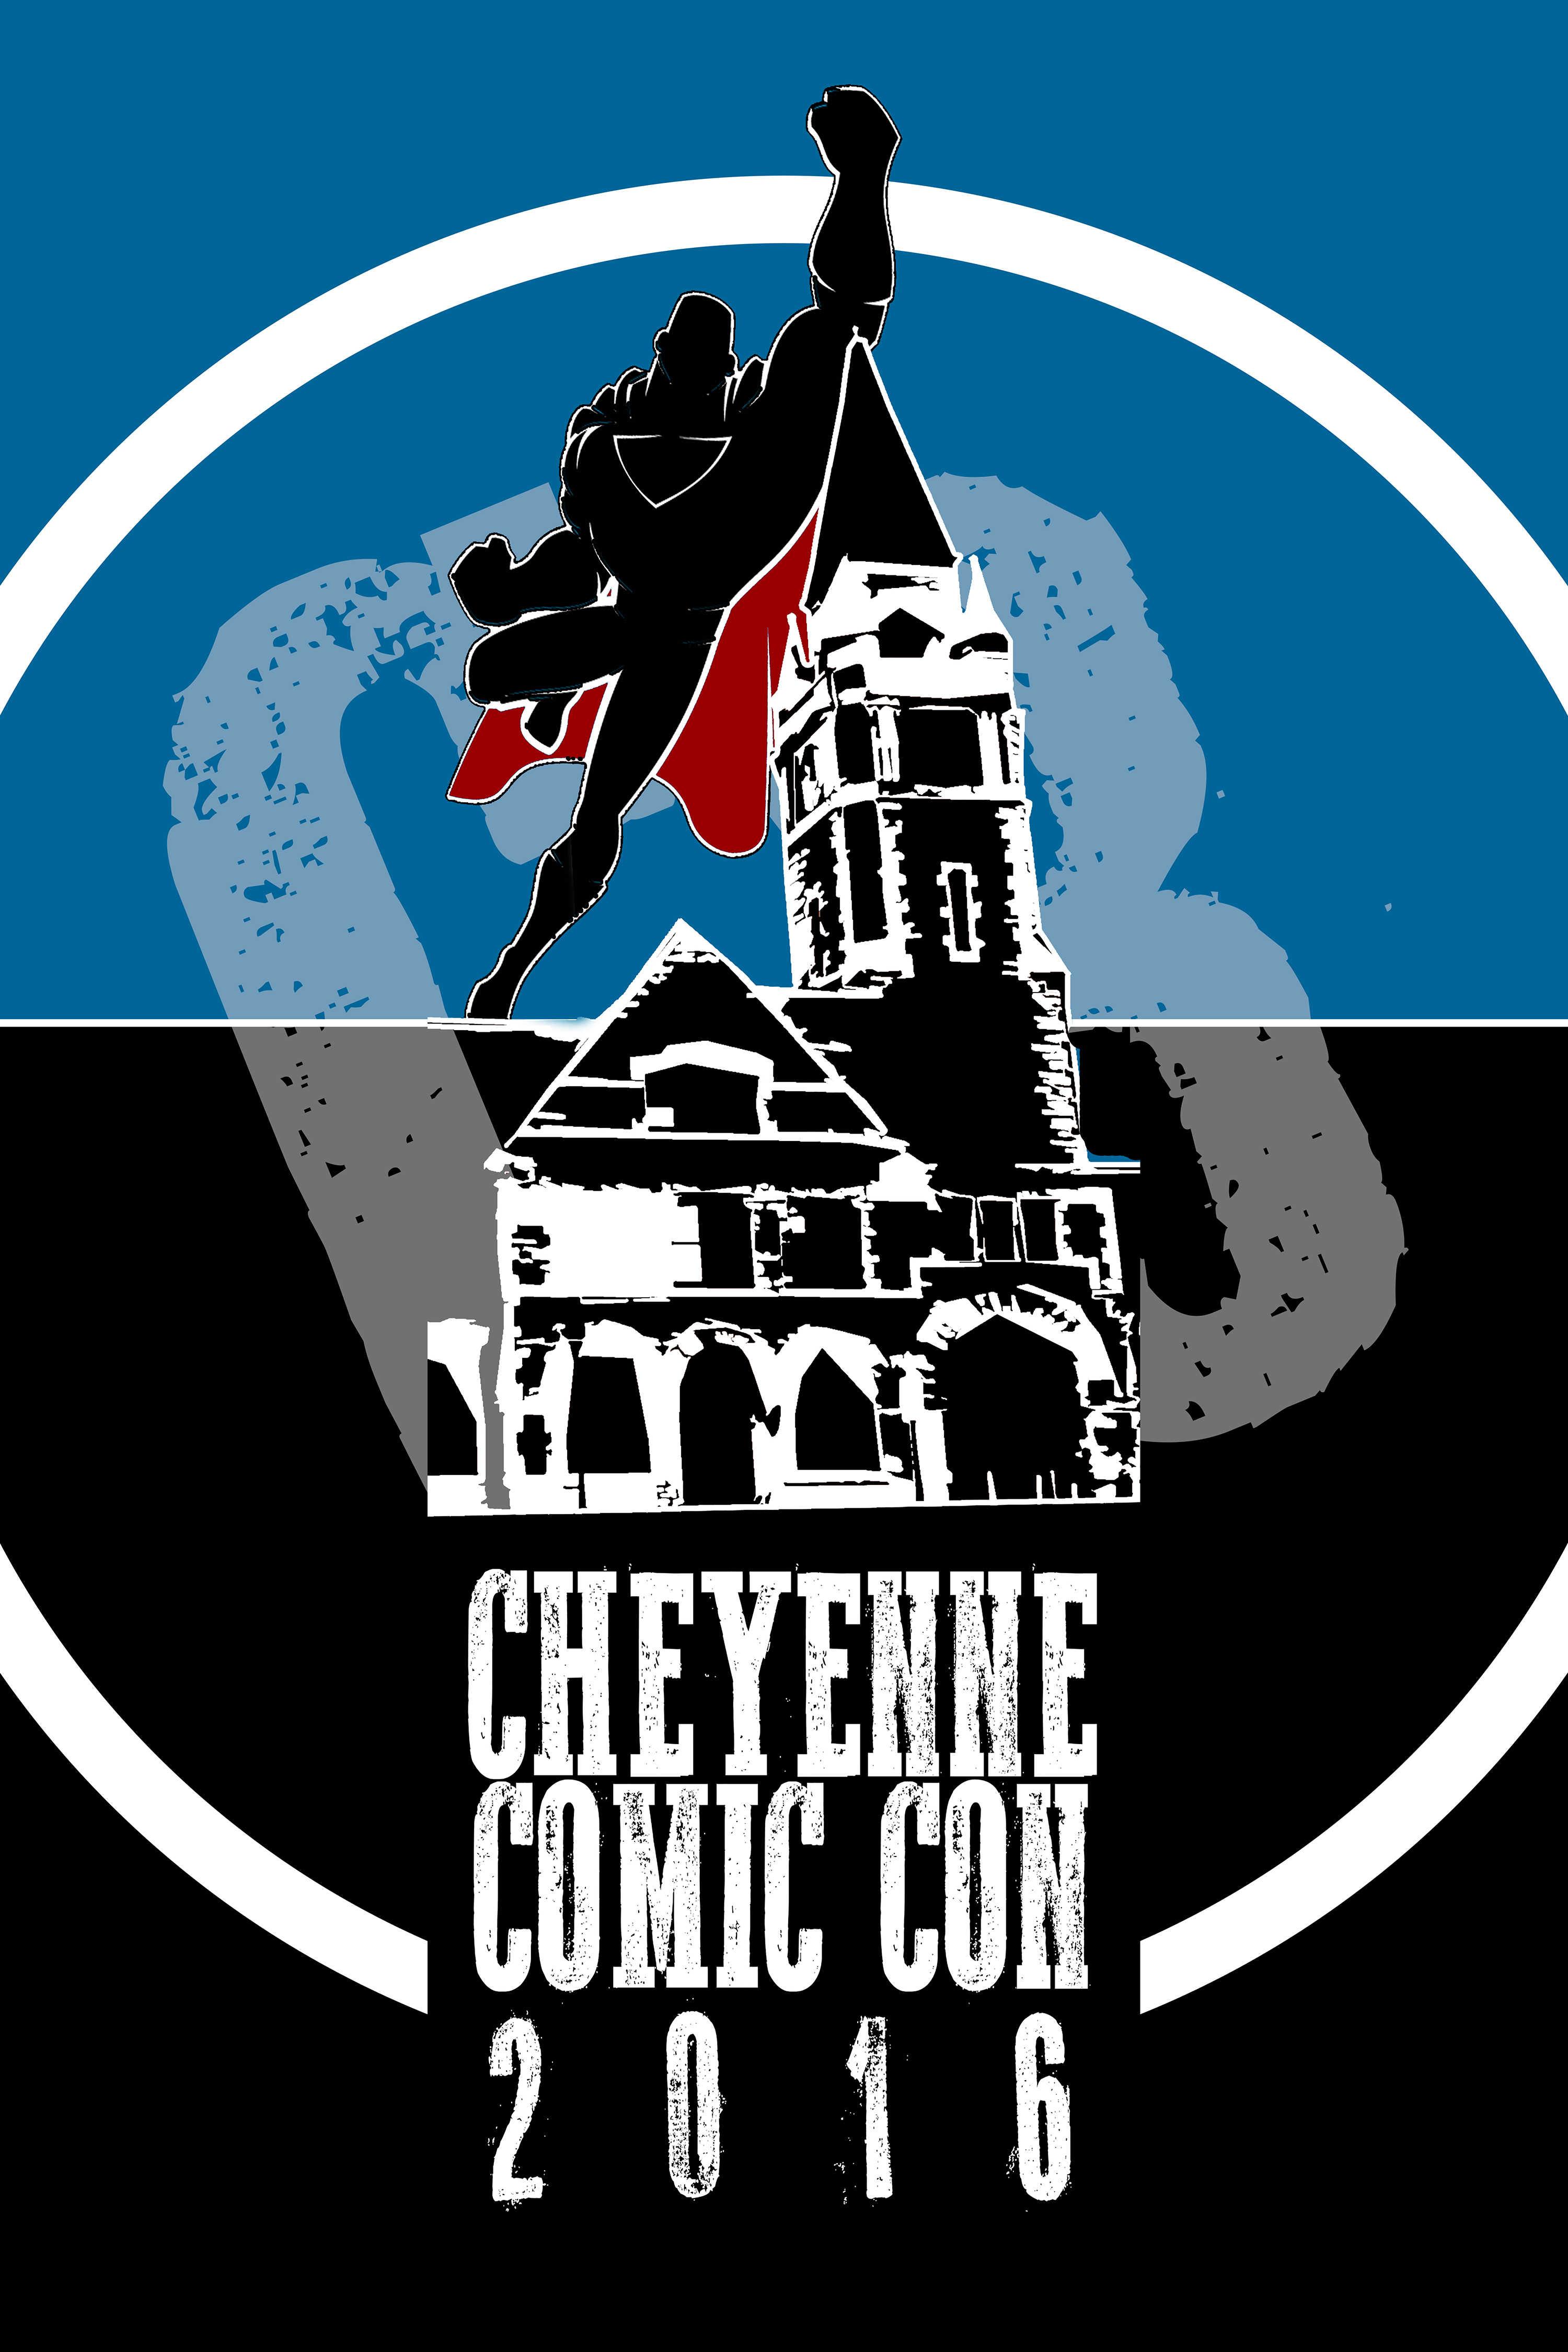 Cheyenne Comic Con